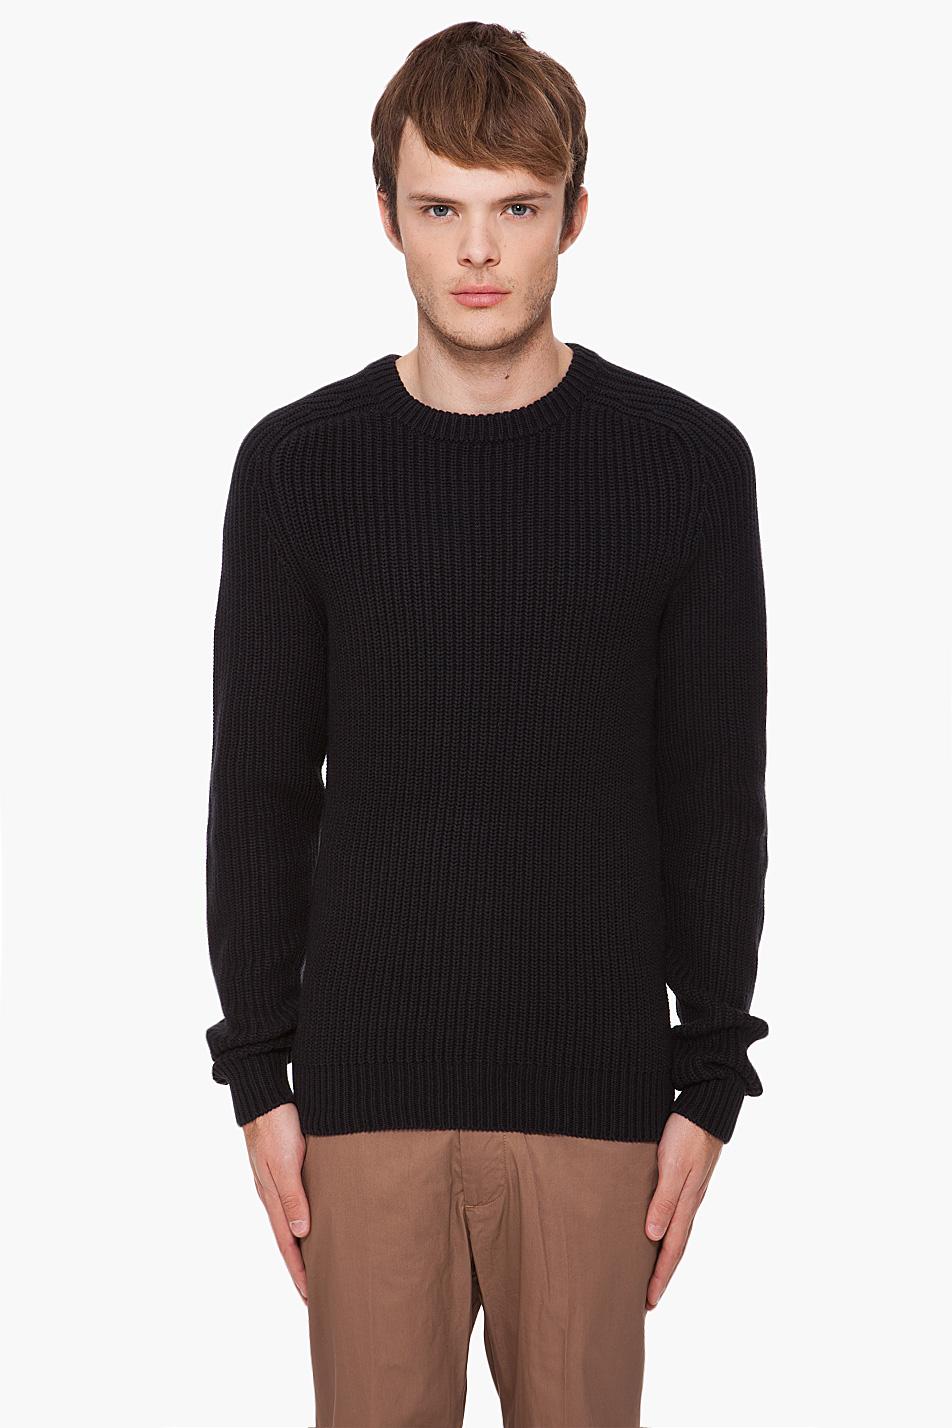 marc by marc jacobs black igor sweater in black for men lyst. Black Bedroom Furniture Sets. Home Design Ideas